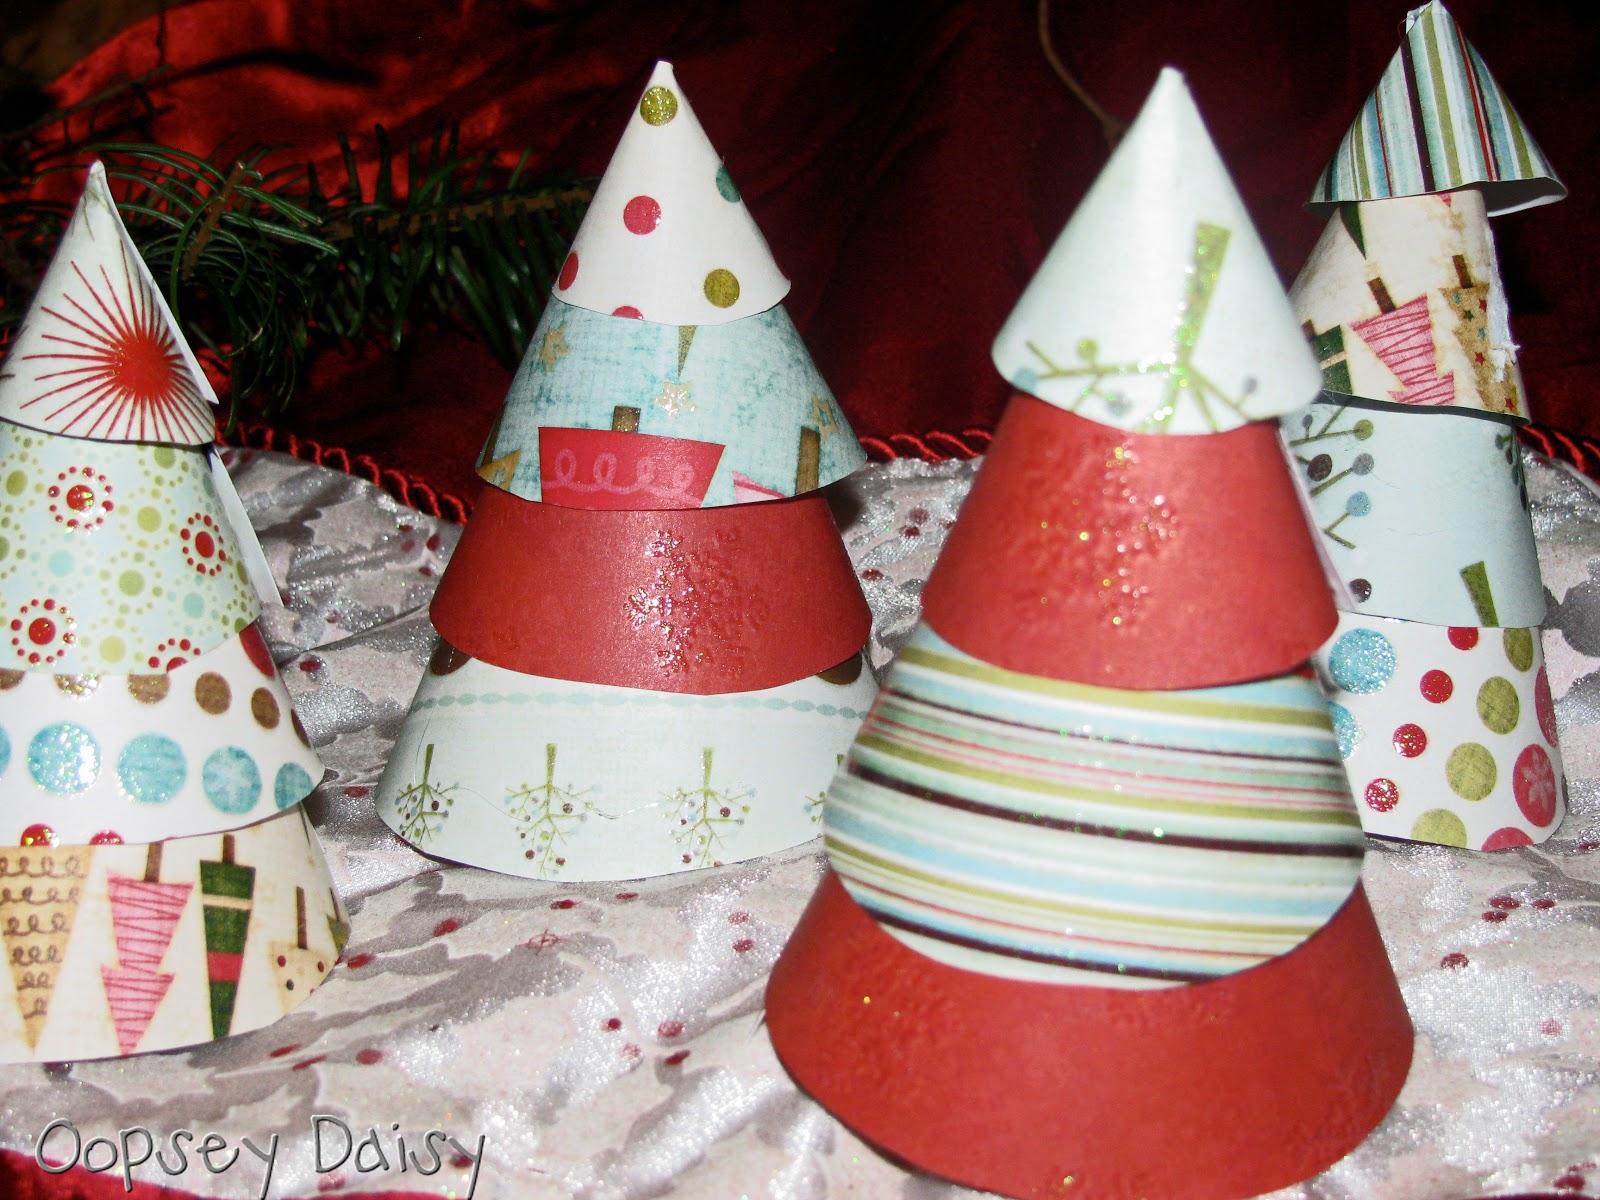 http://4.bp.blogspot.com/_EKdi4TALN1k/TPnmm6dvevI/AAAAAAAAKns/jbhk1wMk_uM/s1600/christmas%252Btree_stacking%252Bgroup.jpg